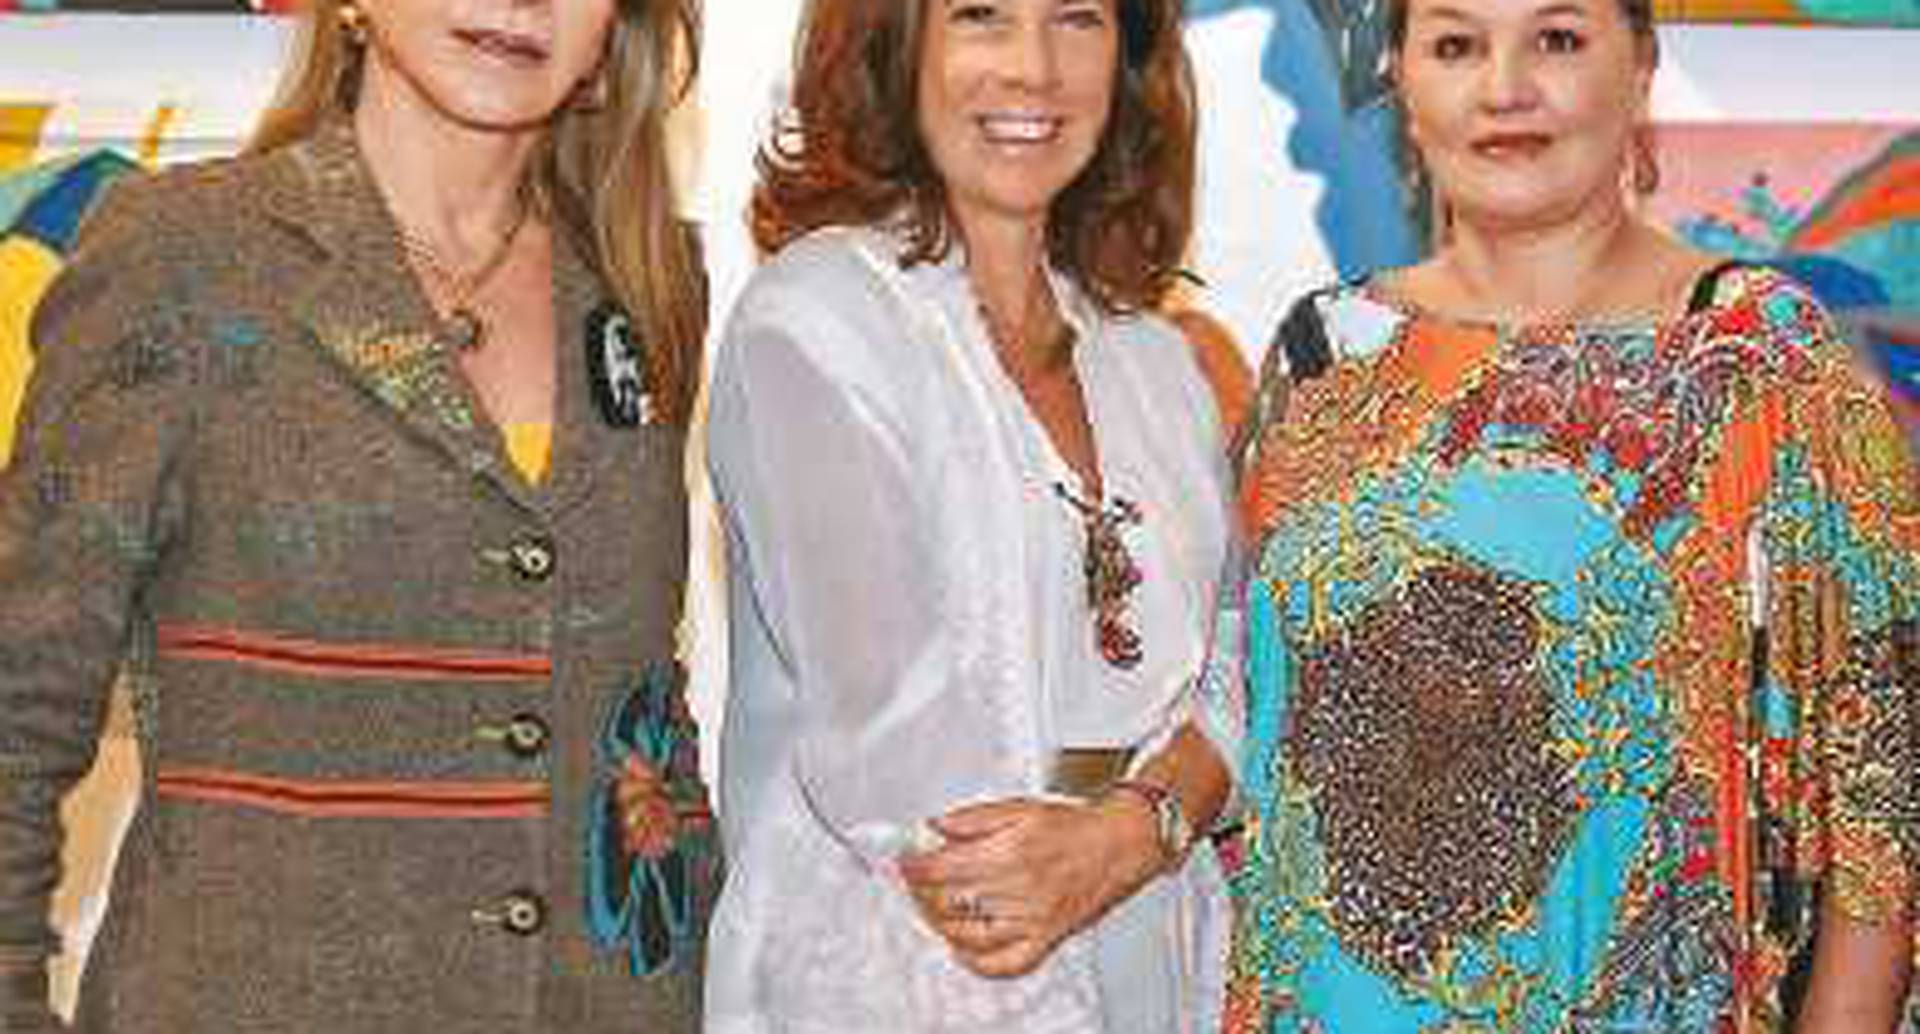 Monika Hartmann, Lola Castello y Camila Sánchez.